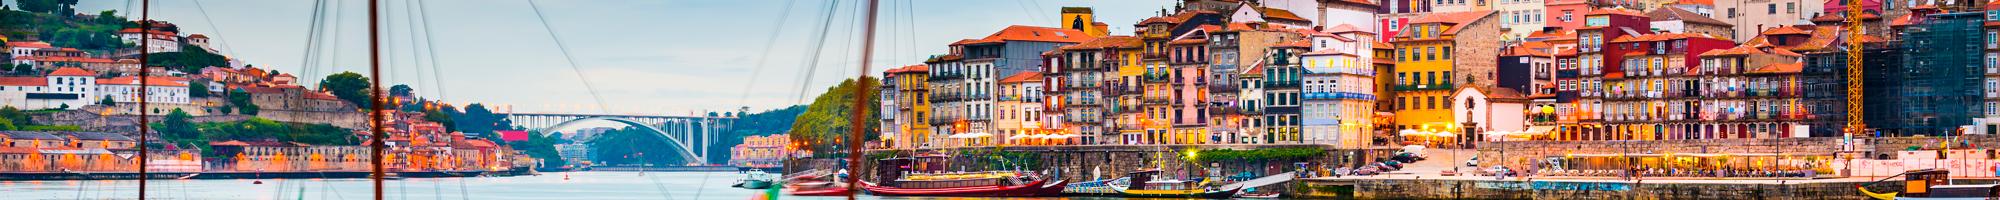 hoteles en Portugal